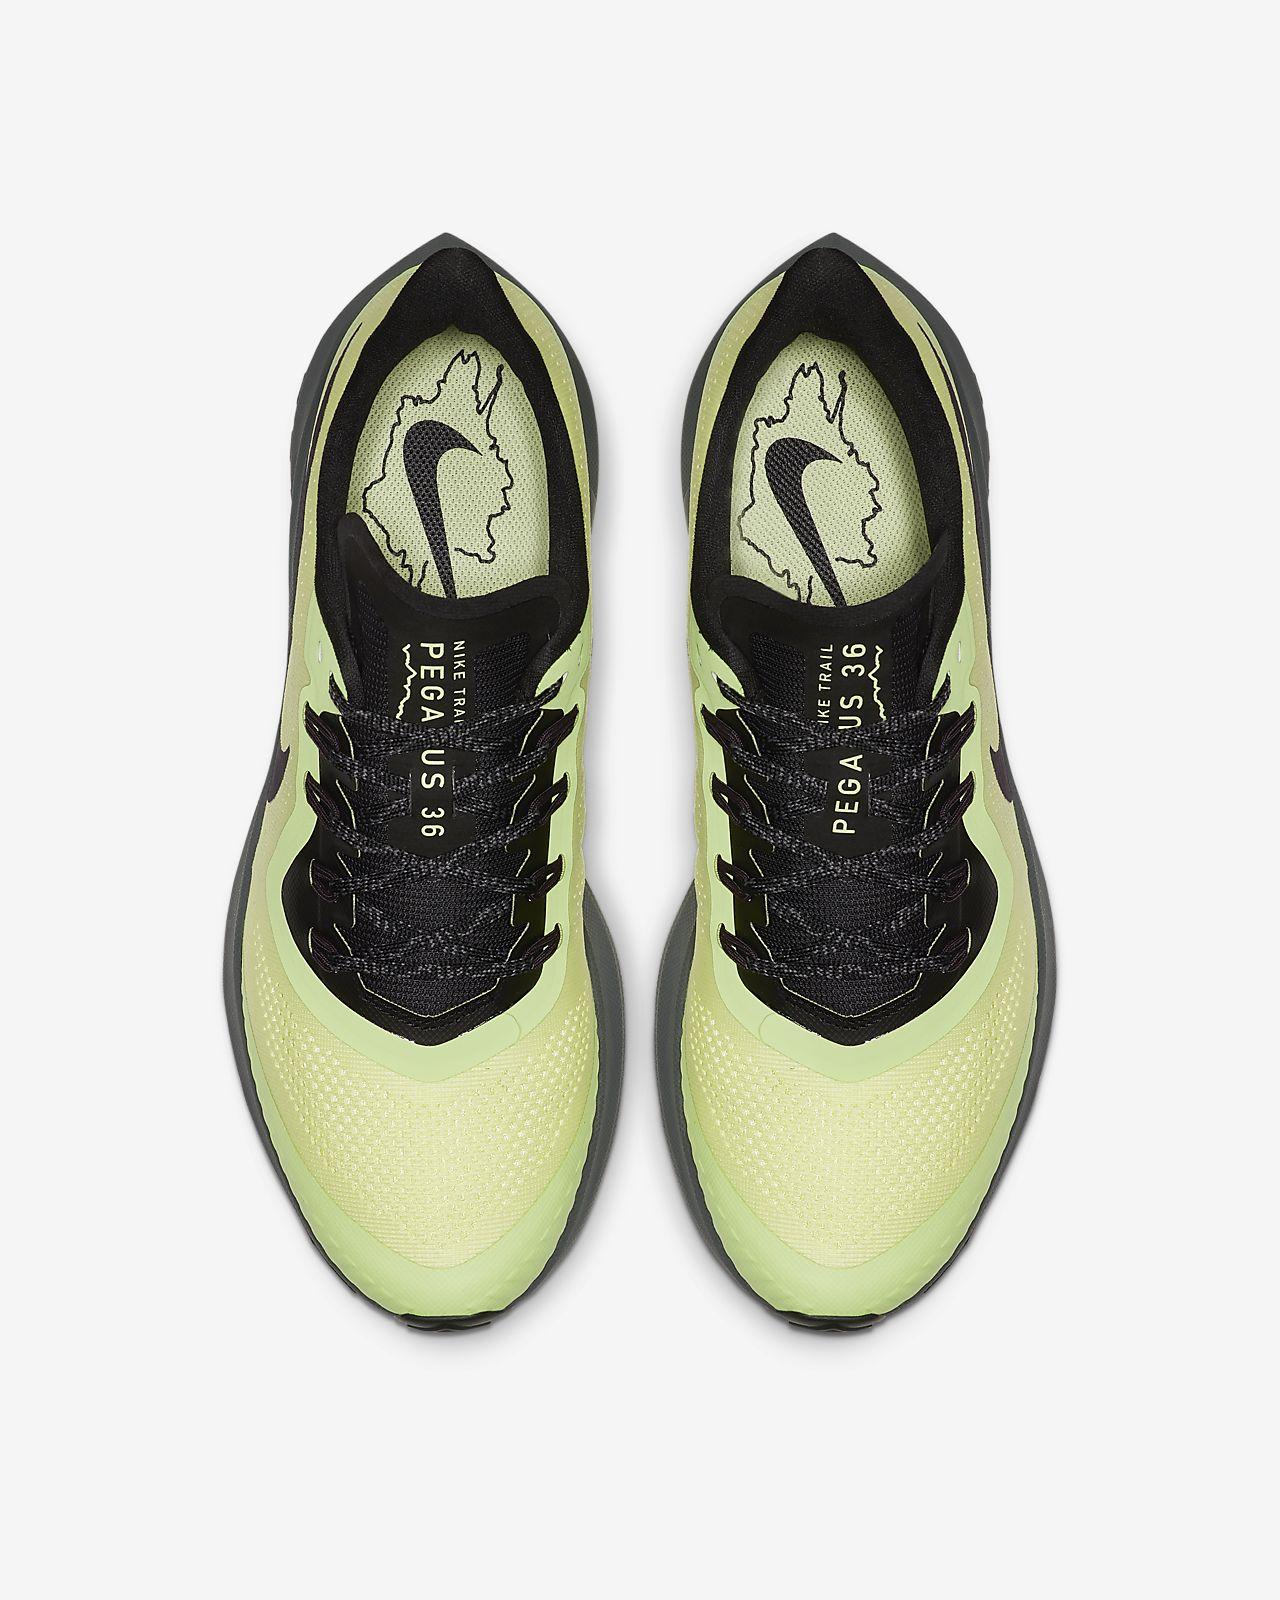 bfb9f1095e Calzado de running para hombre Nike Air Zoom Pegasus 36 Trail. Nike ...